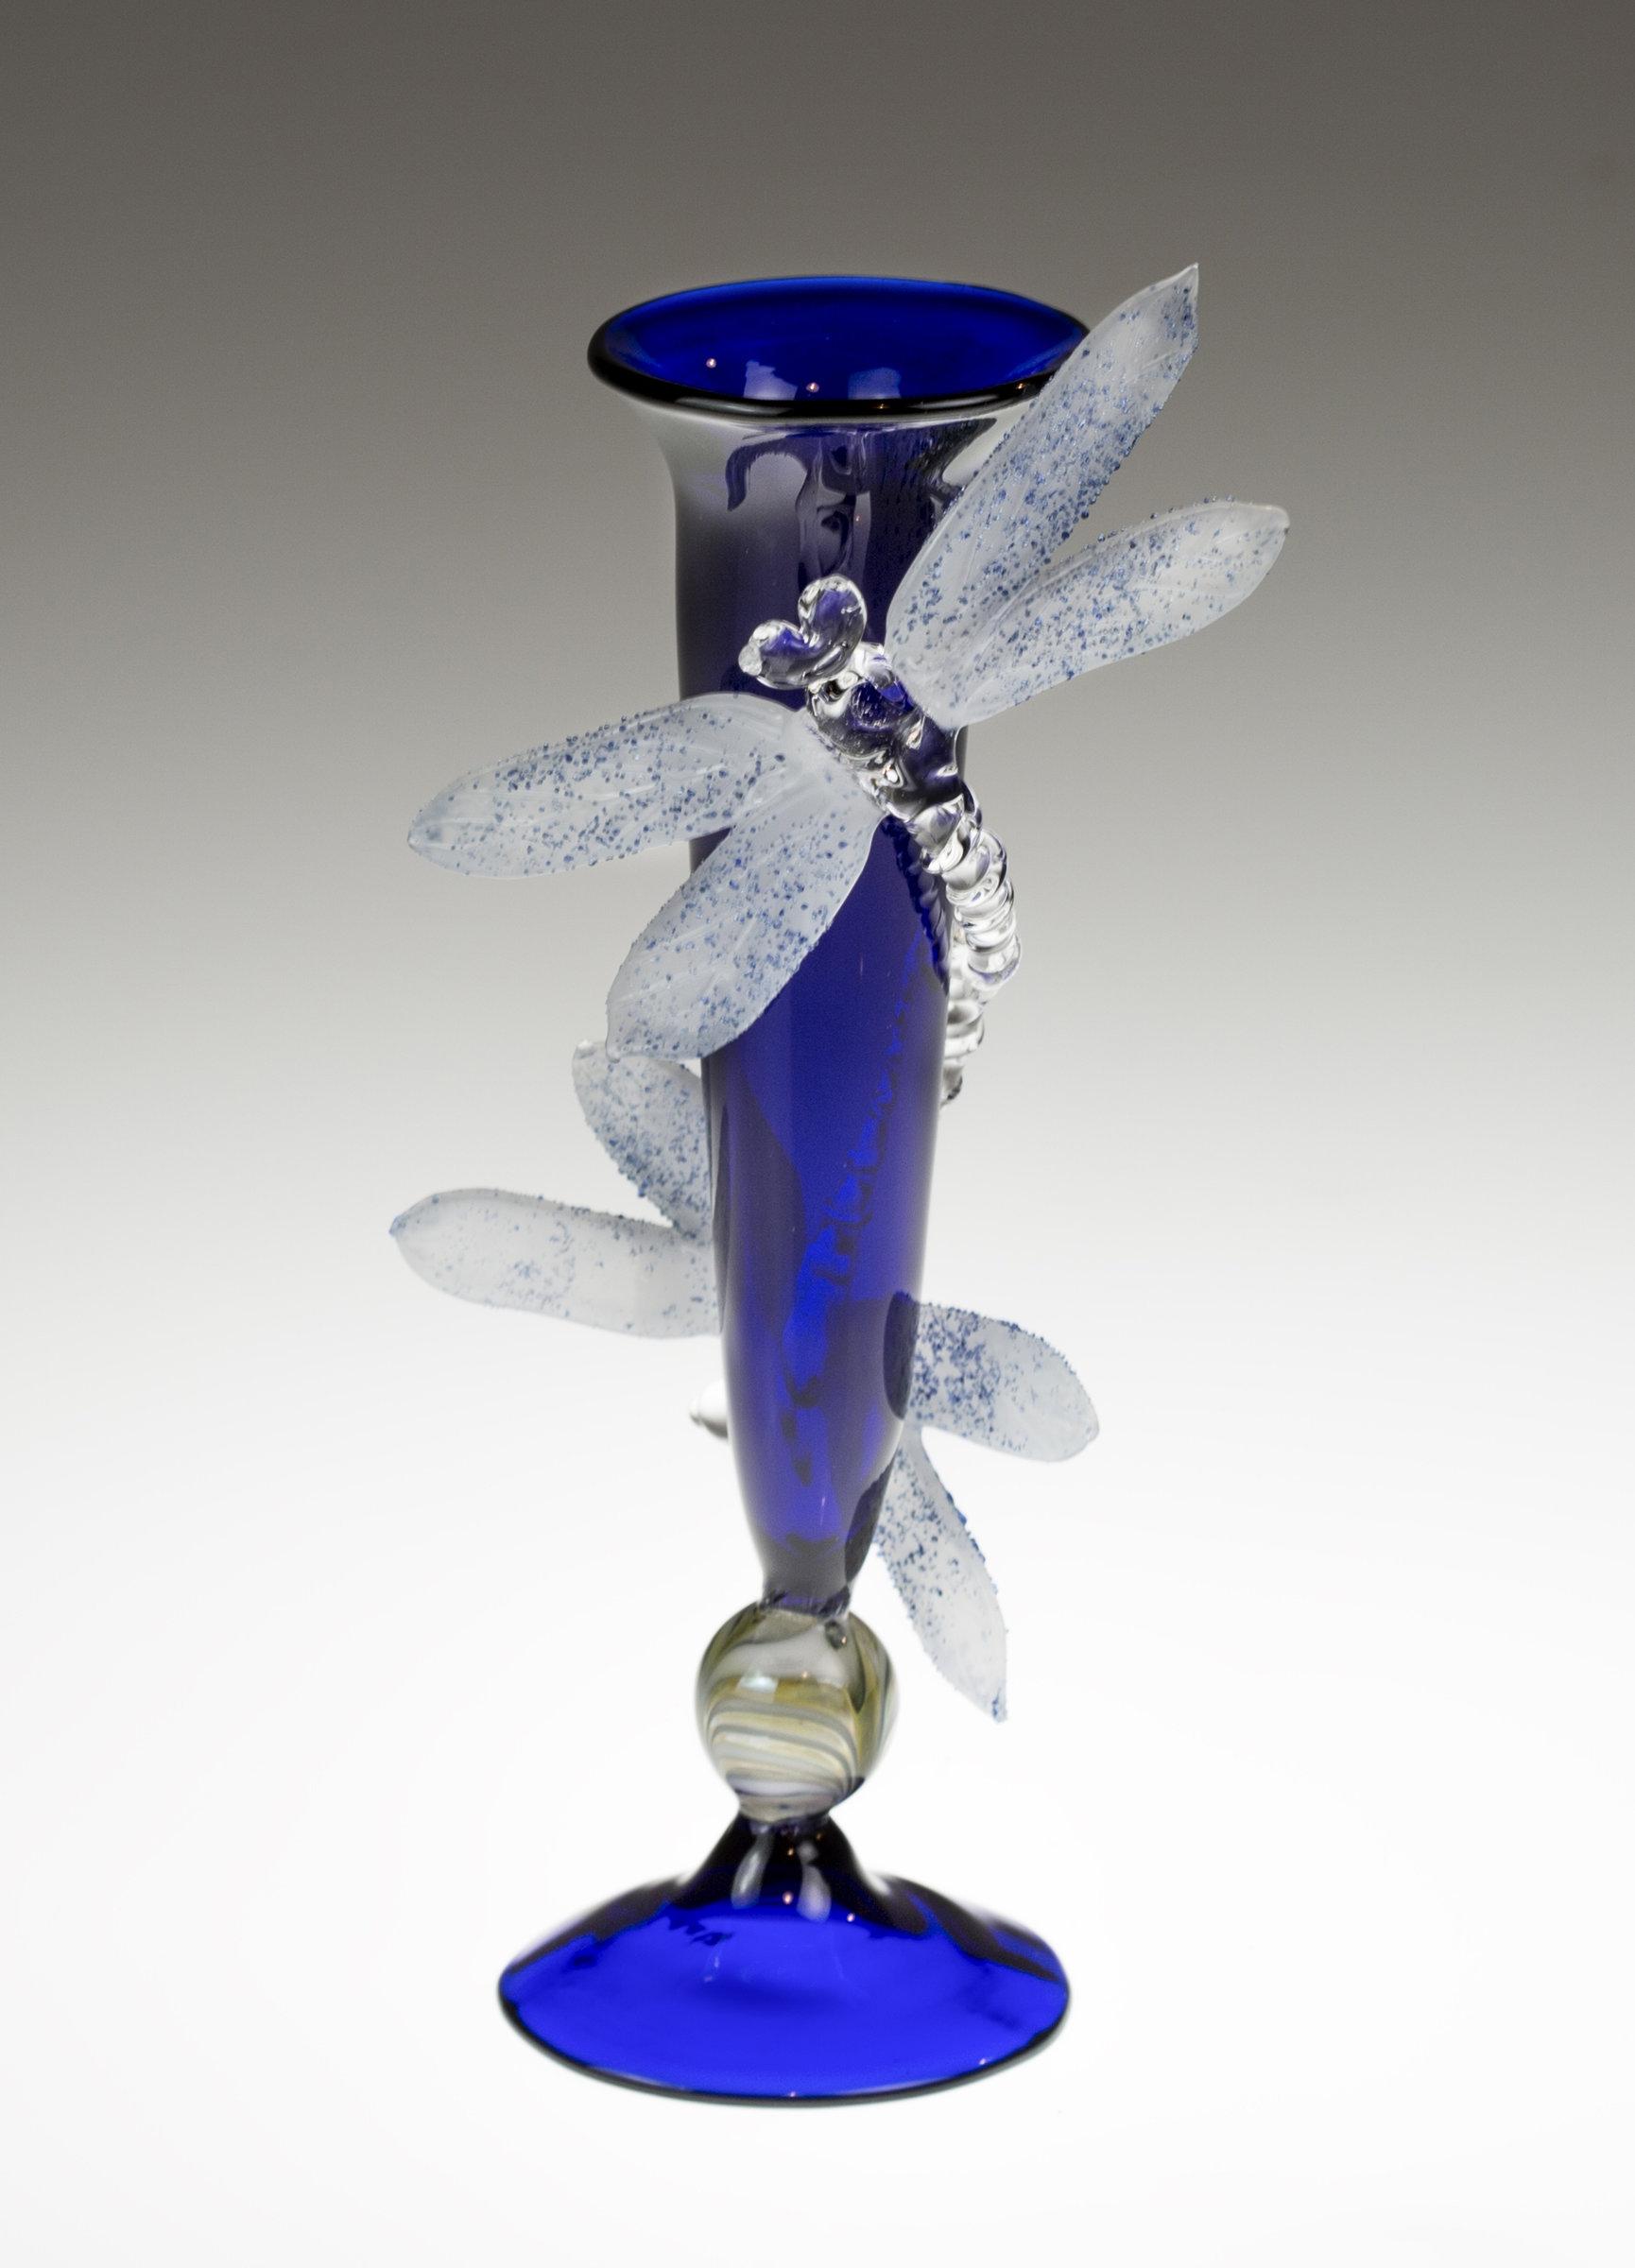 Cobalt Blue Bud Vase With Dragonfly By Loy Allen Art